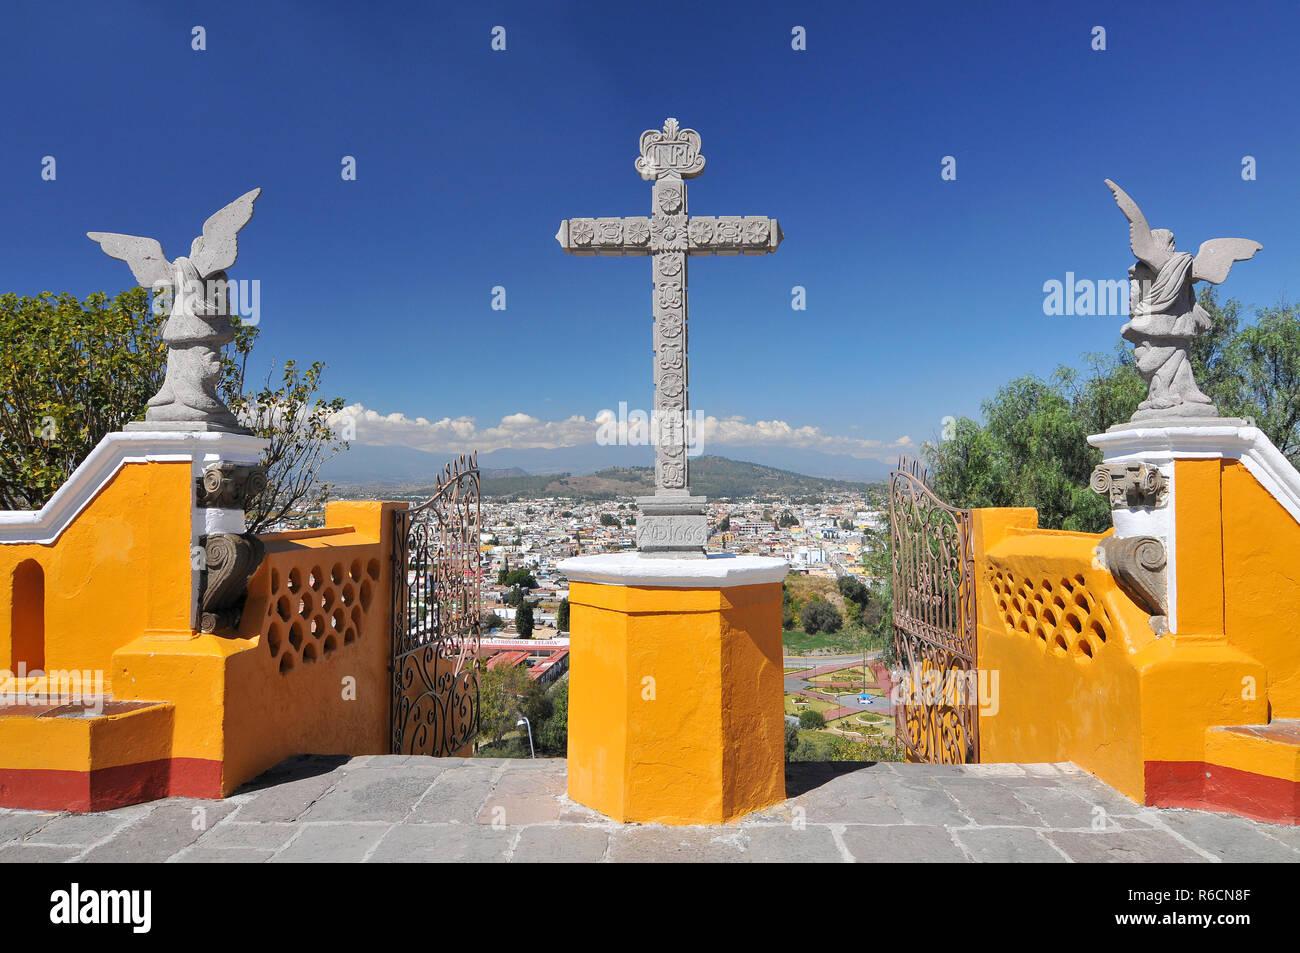 Nuestra Senora De Los Remedios, The Church Located On Top Of The Cholula Pyramid In Mexico Stock Photo